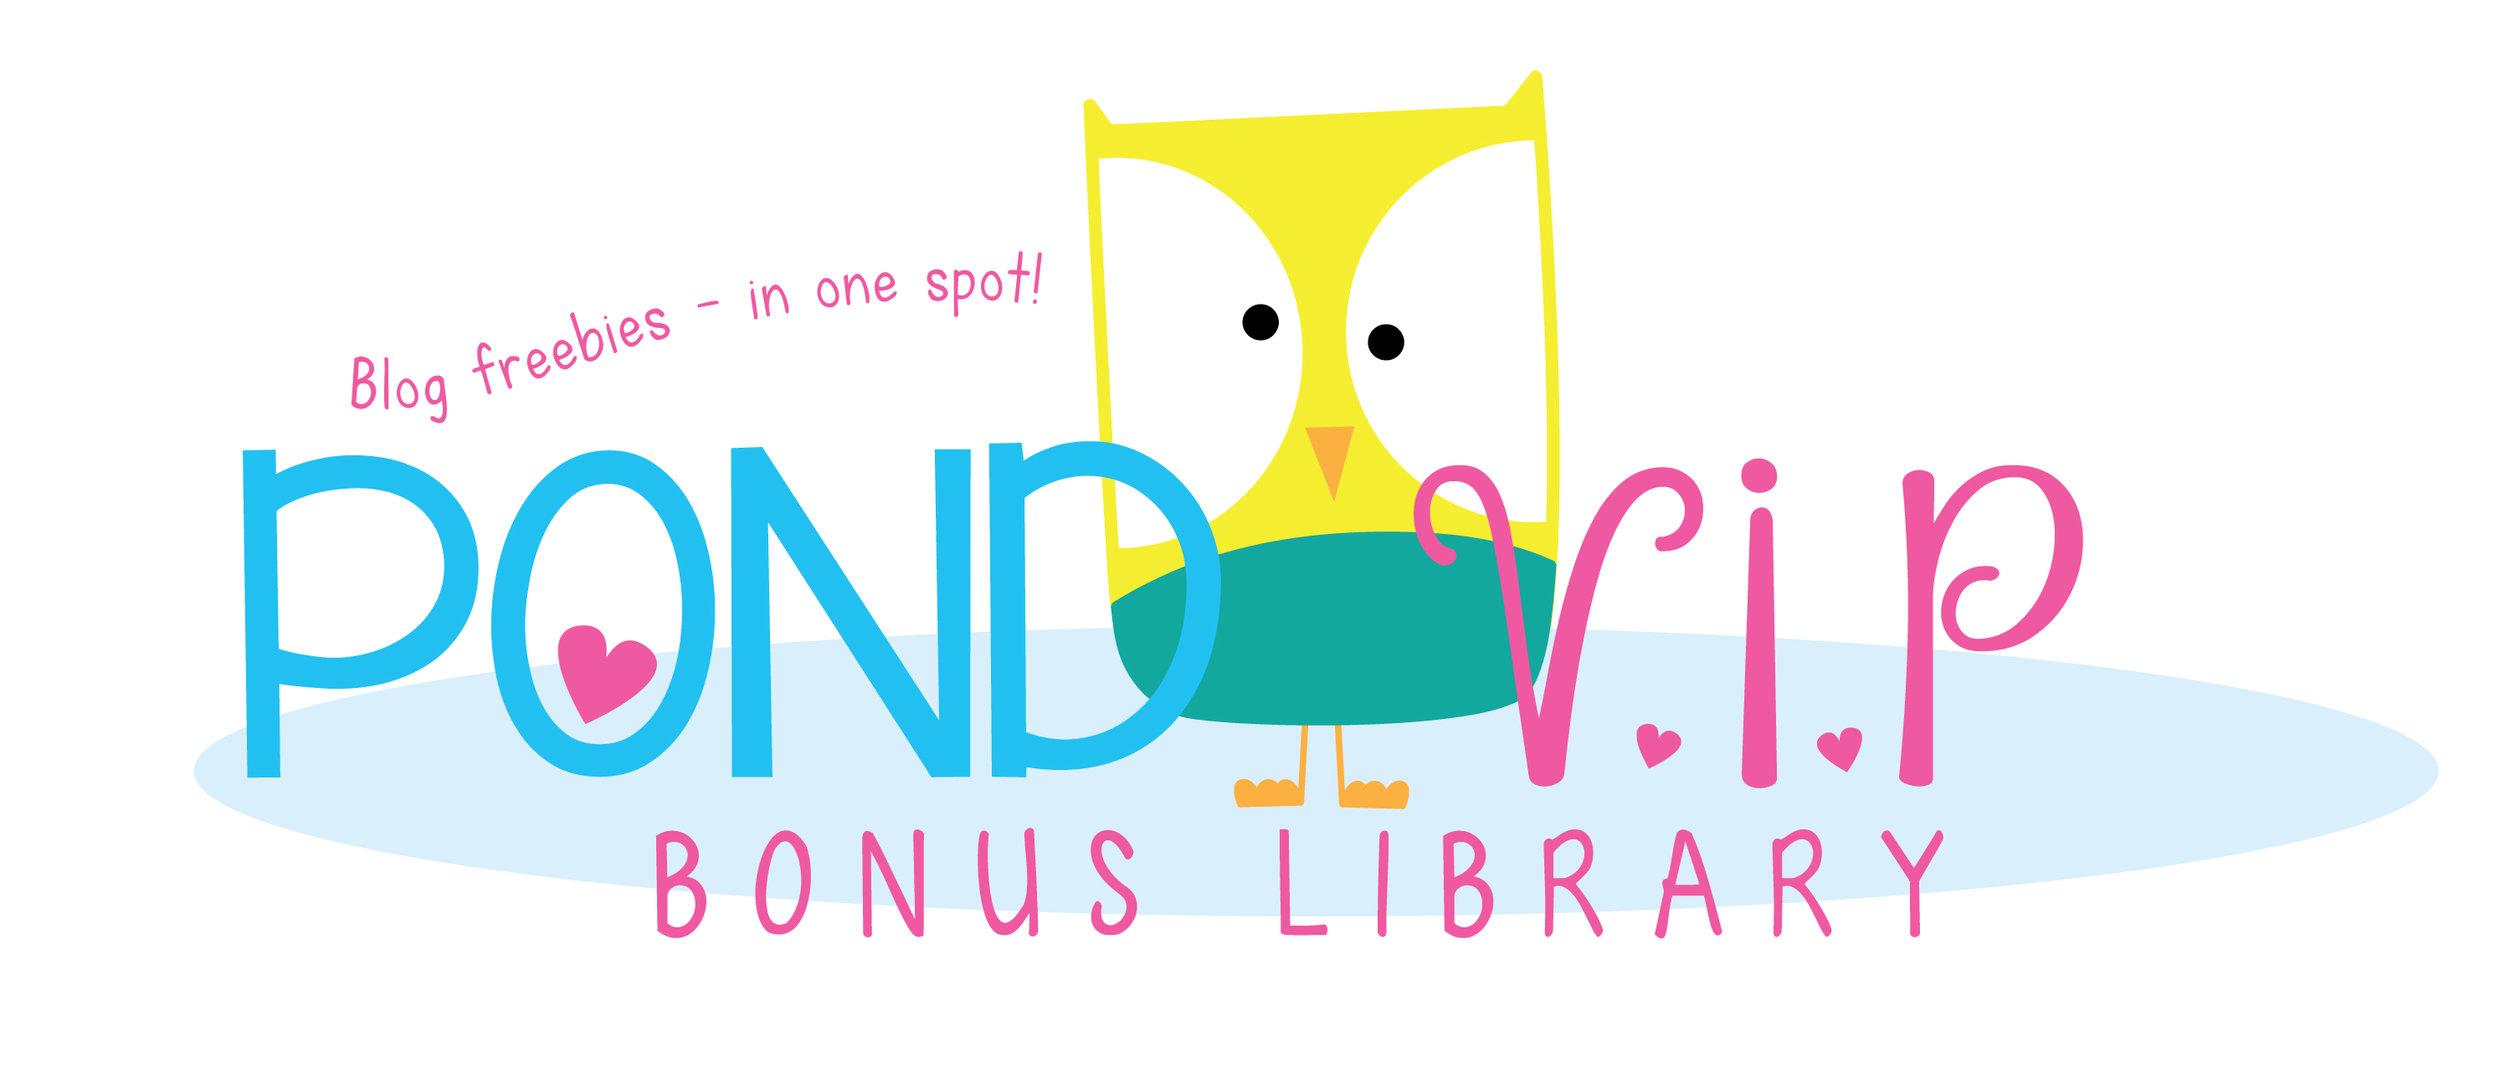 bonus-library-header.jpg